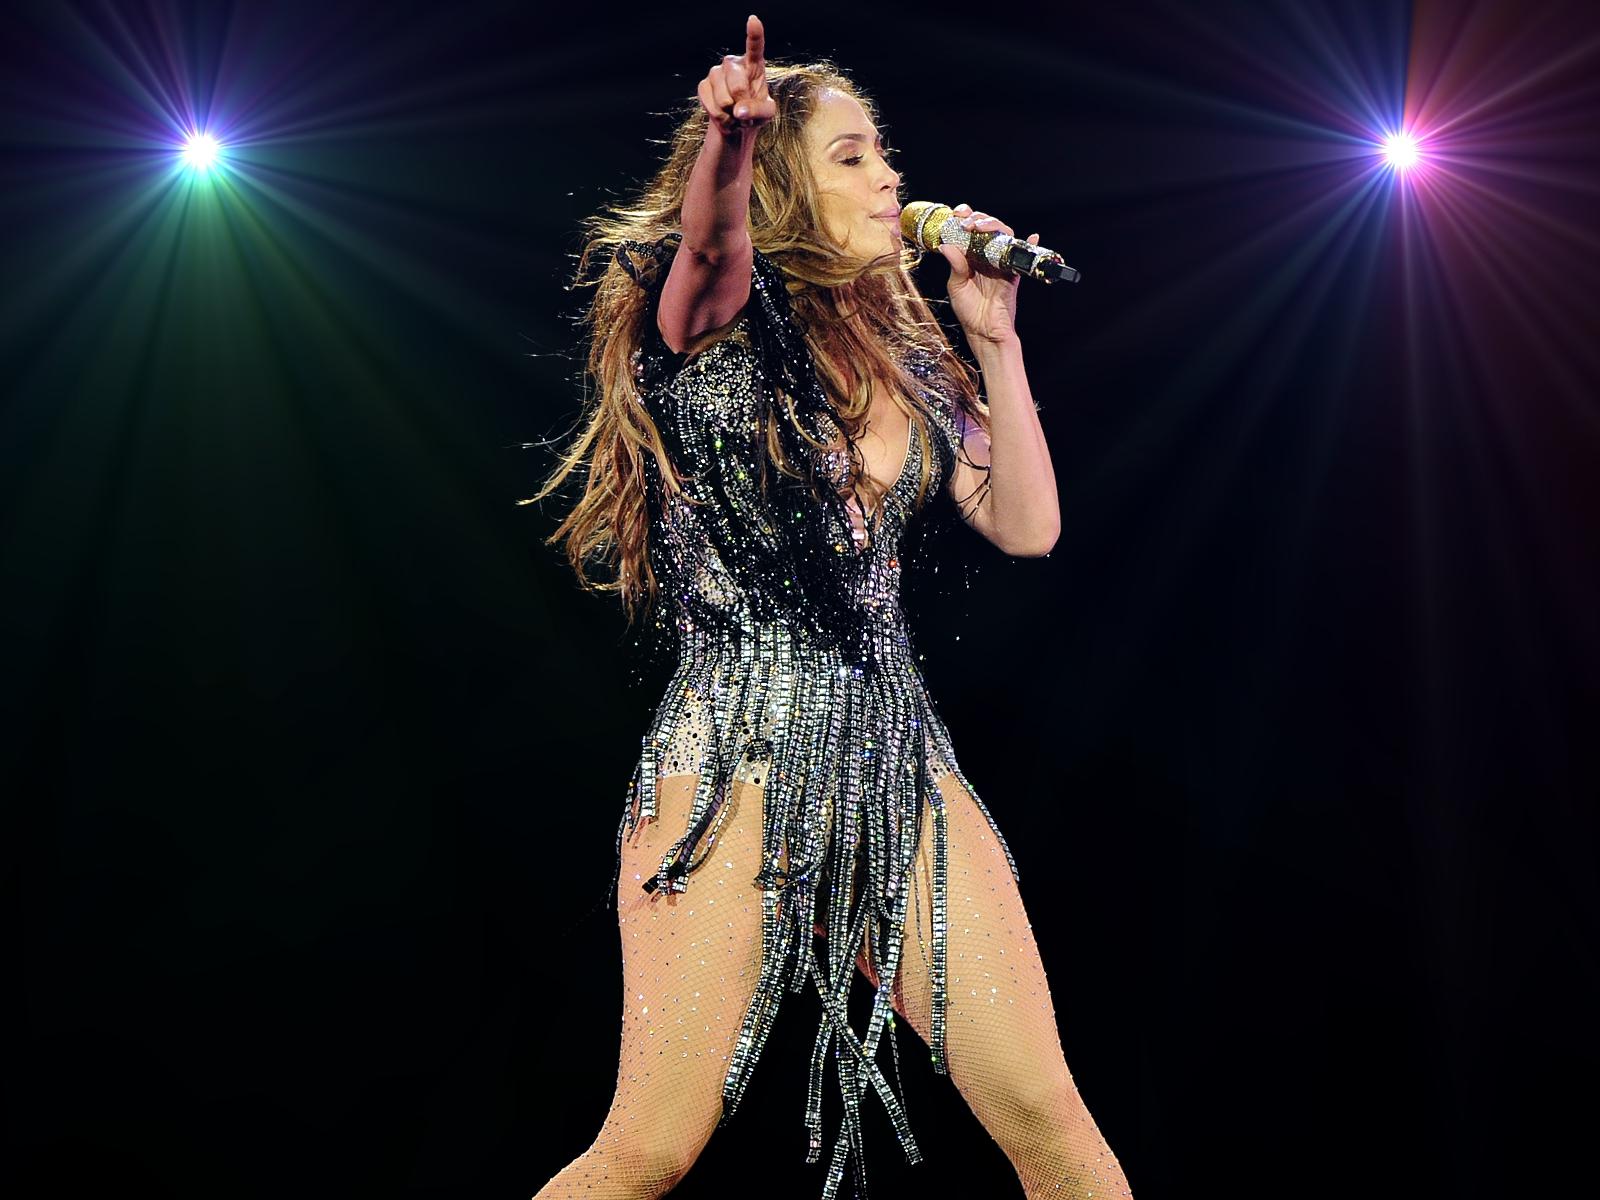 My Sexy Celebrities Wallpapers: Jennifer Lopez Wallpapers